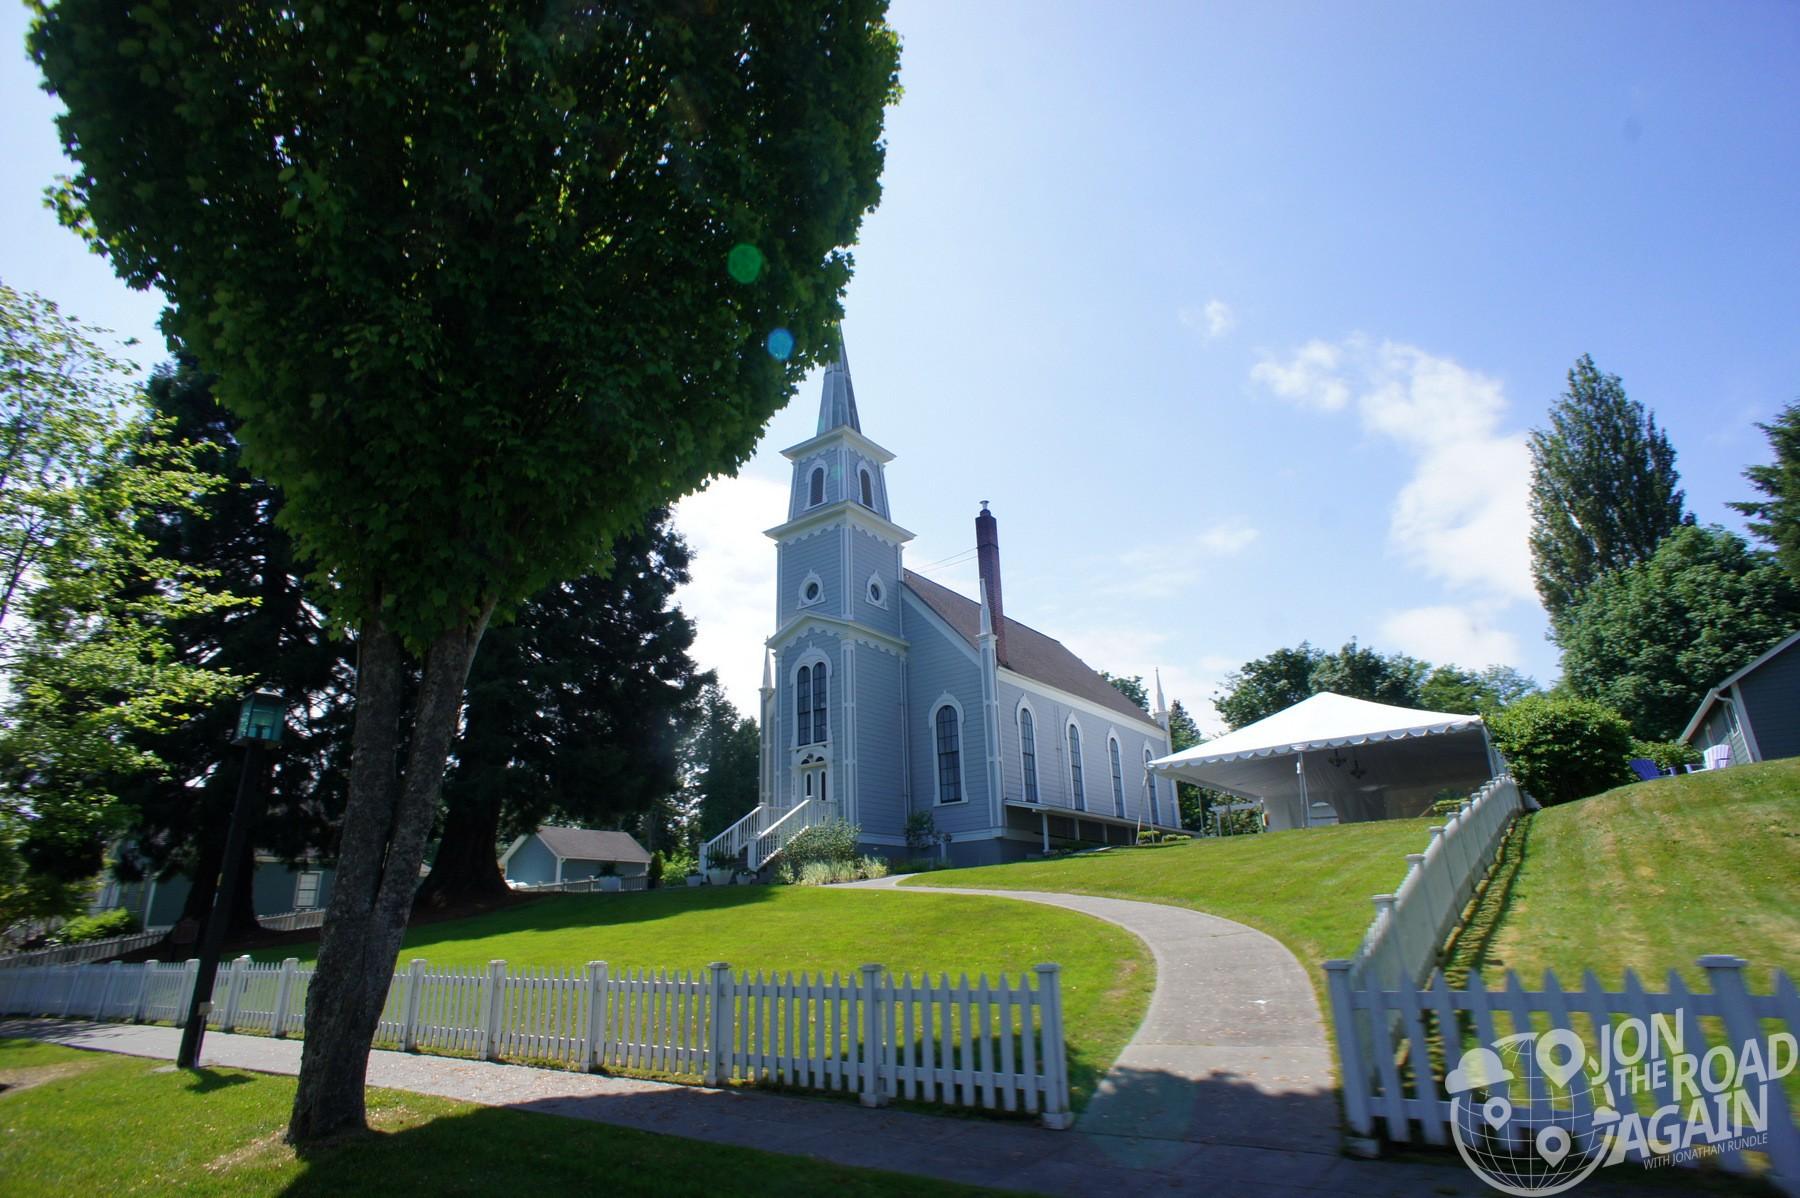 Church in Port Gamble